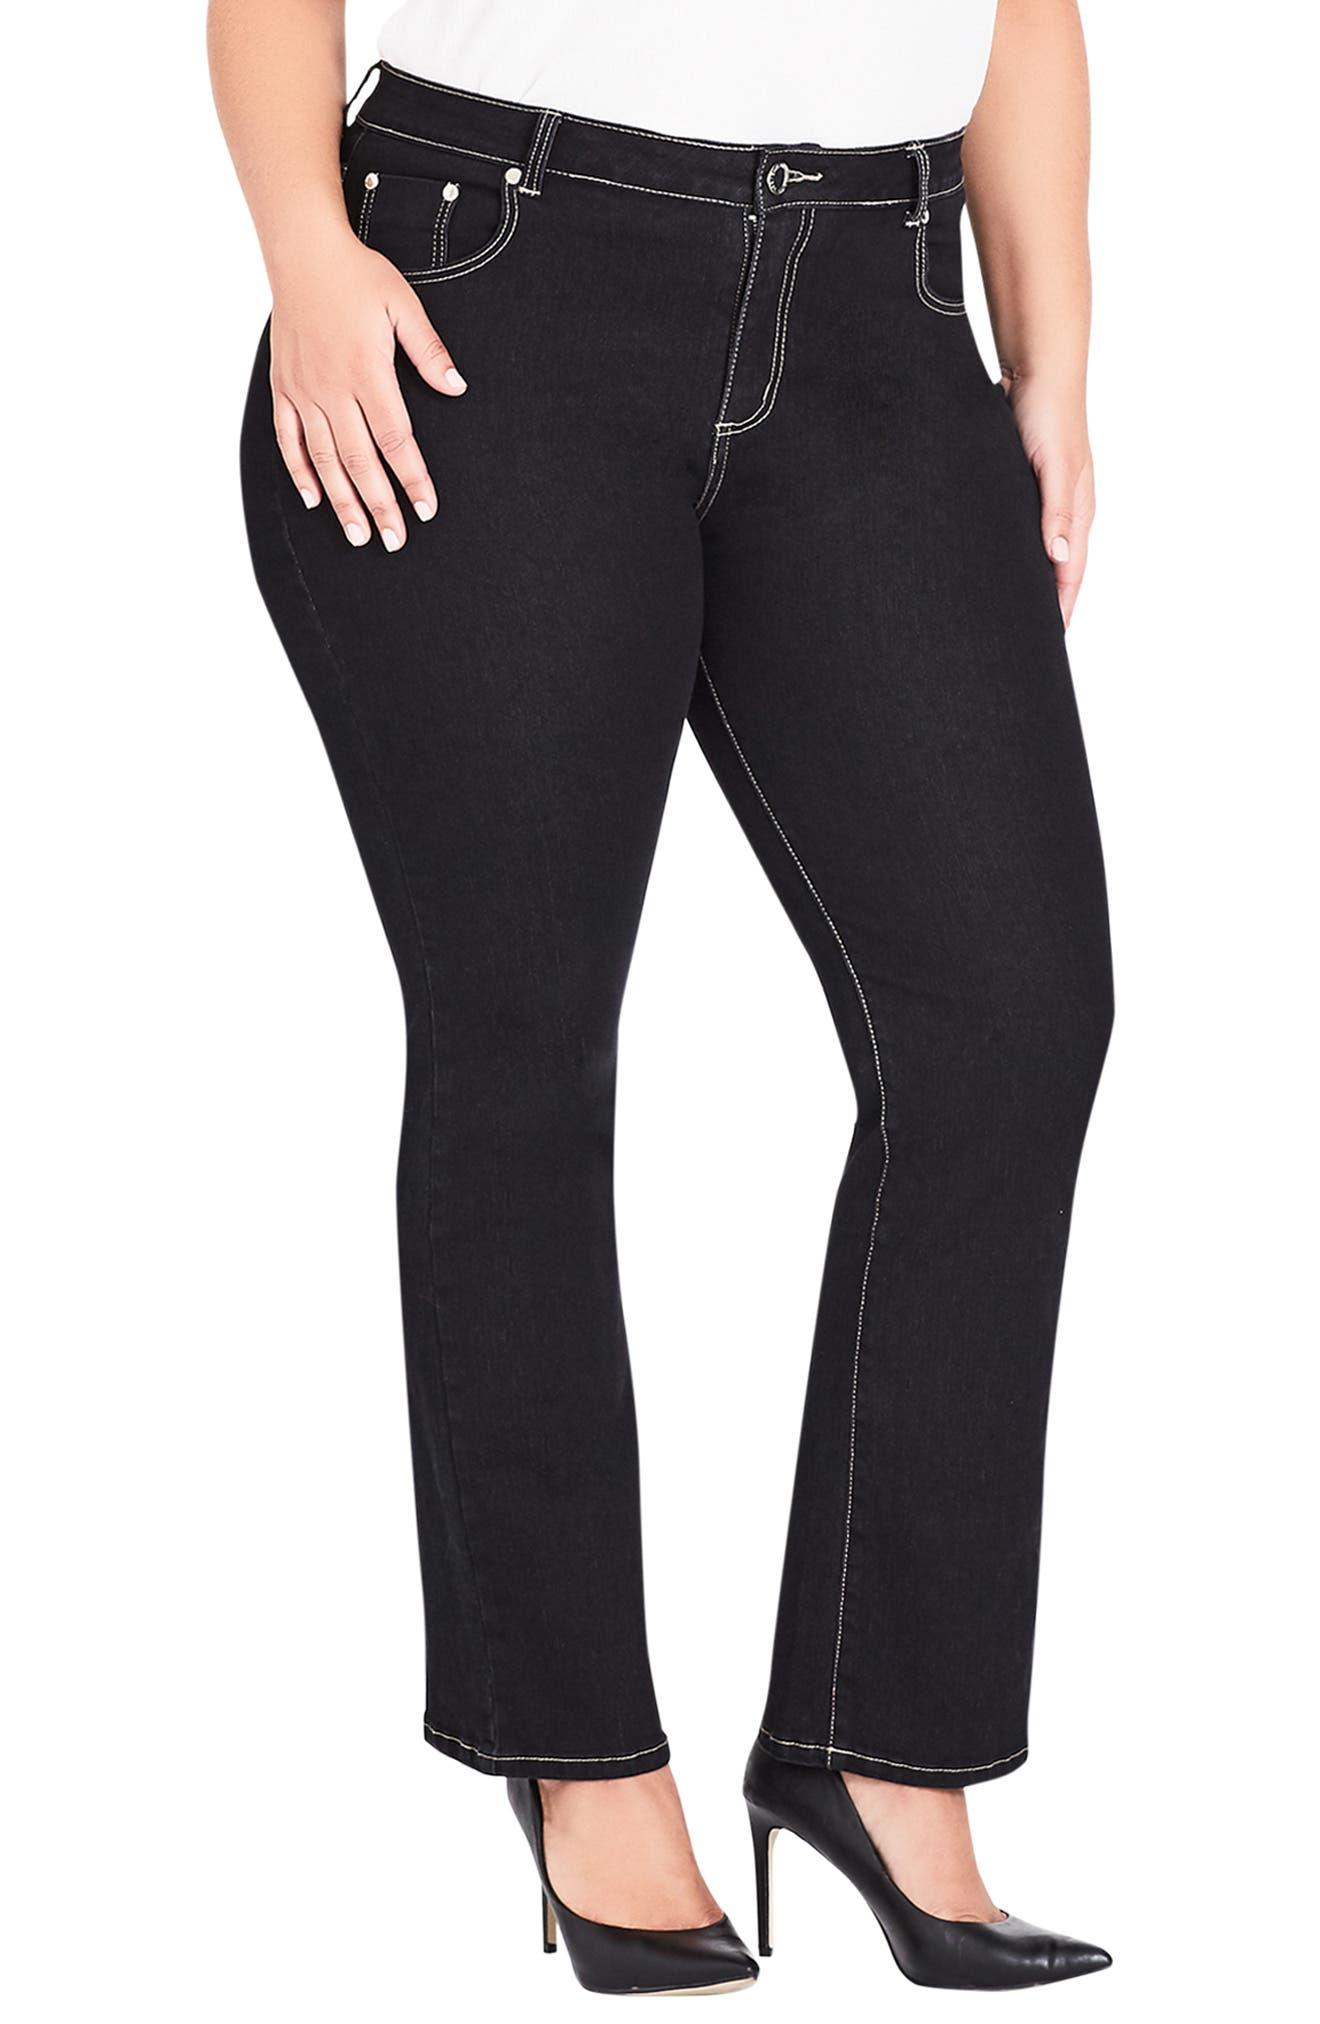 CITY CHIC Regular Fit Bootcut Jeans, Main, color, BLACK